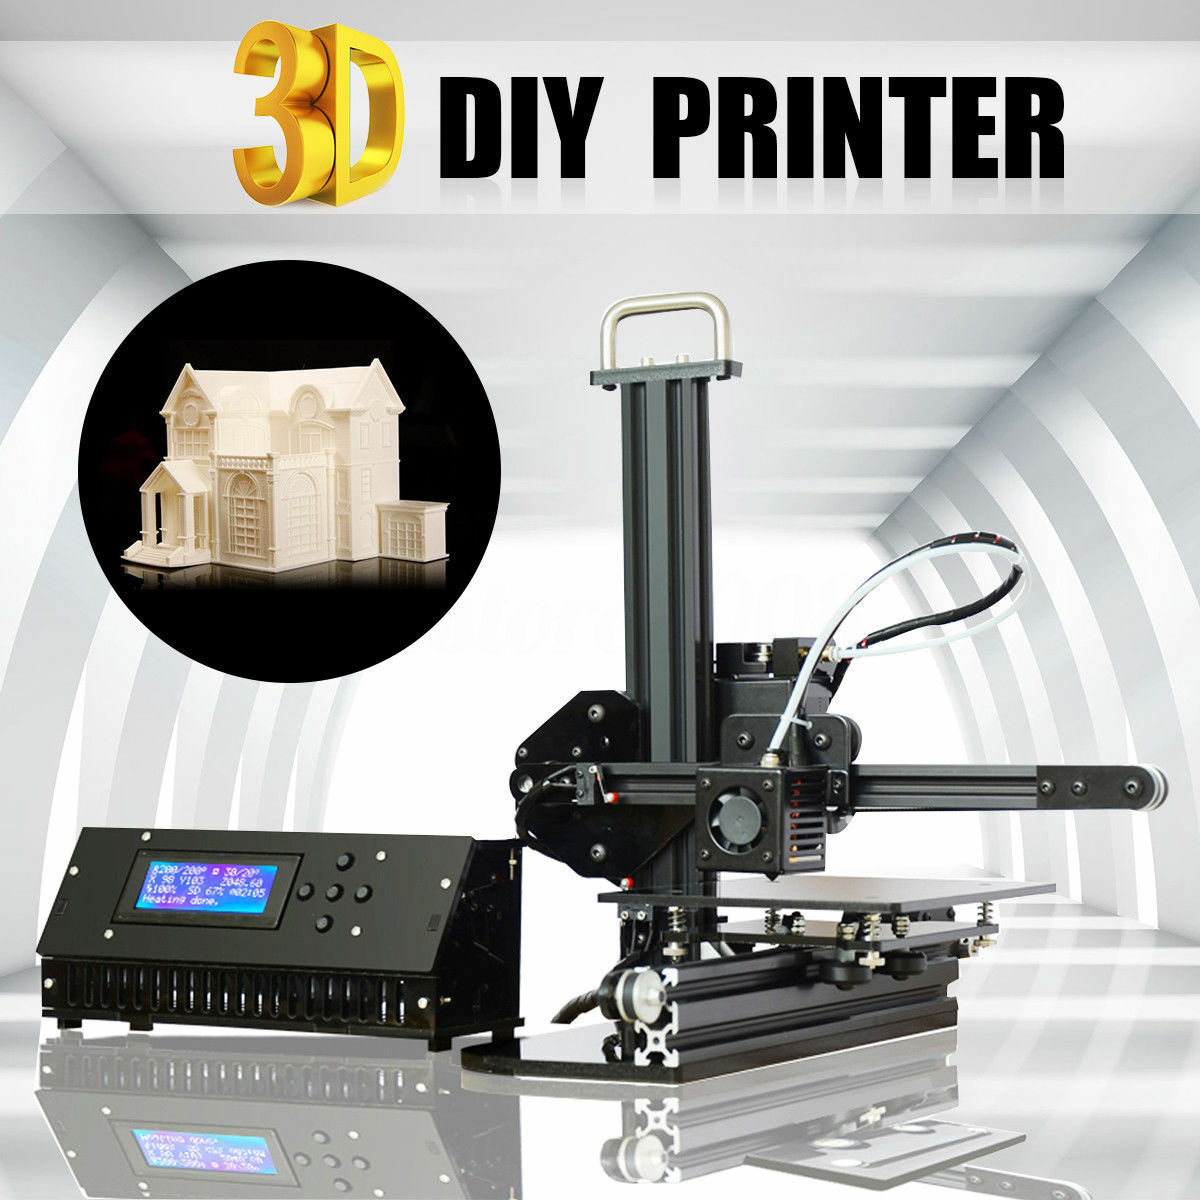 Details about Tronxy X1 3D Printer DIY Kit Upgraded Quality High Precision  Desktop +8G SD Card